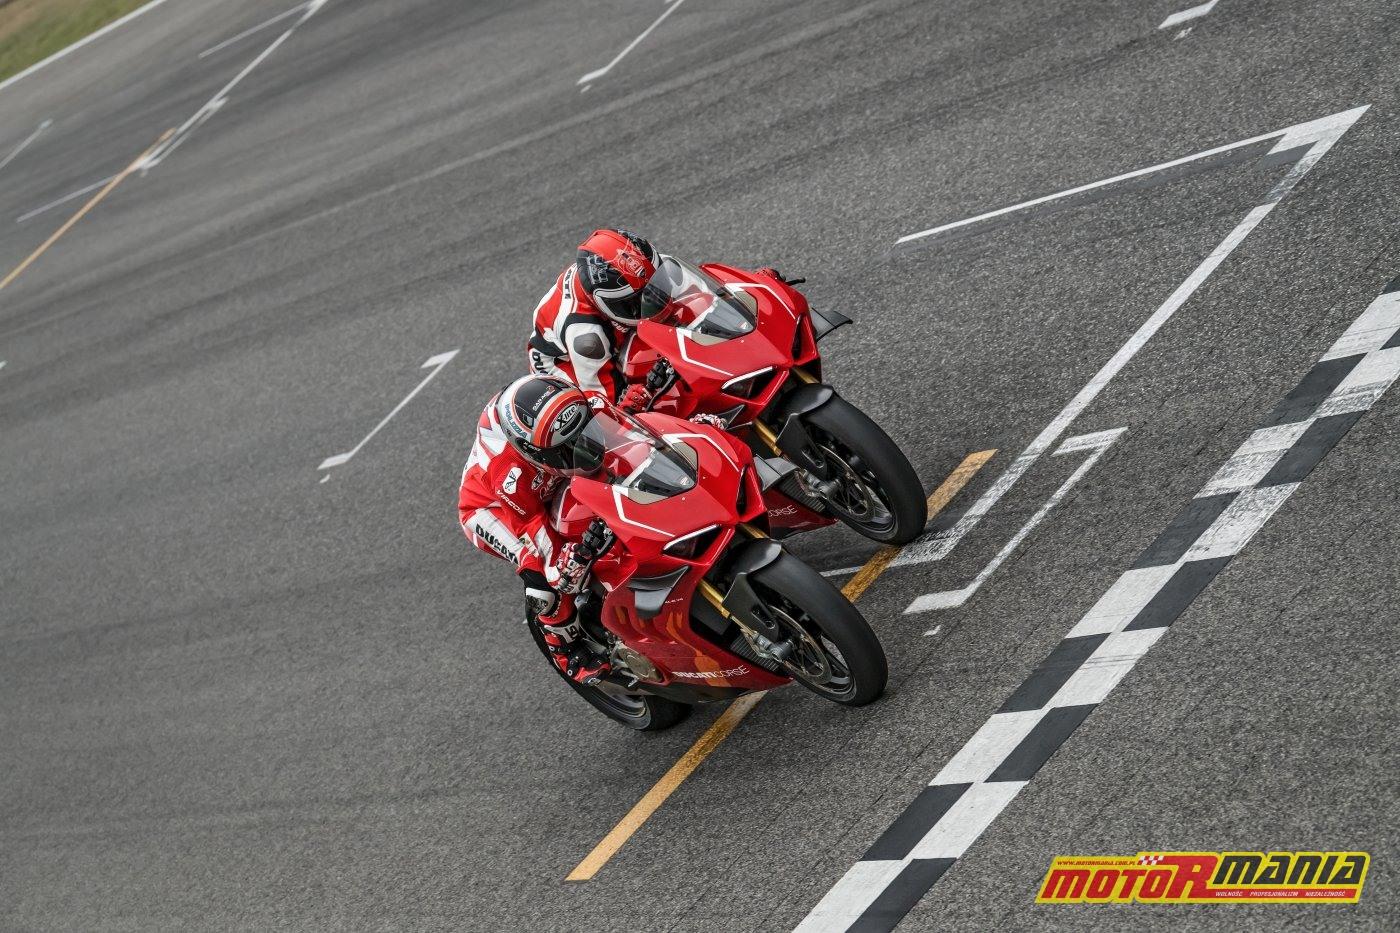 Ducati Panigale V4 R 2019 (6)